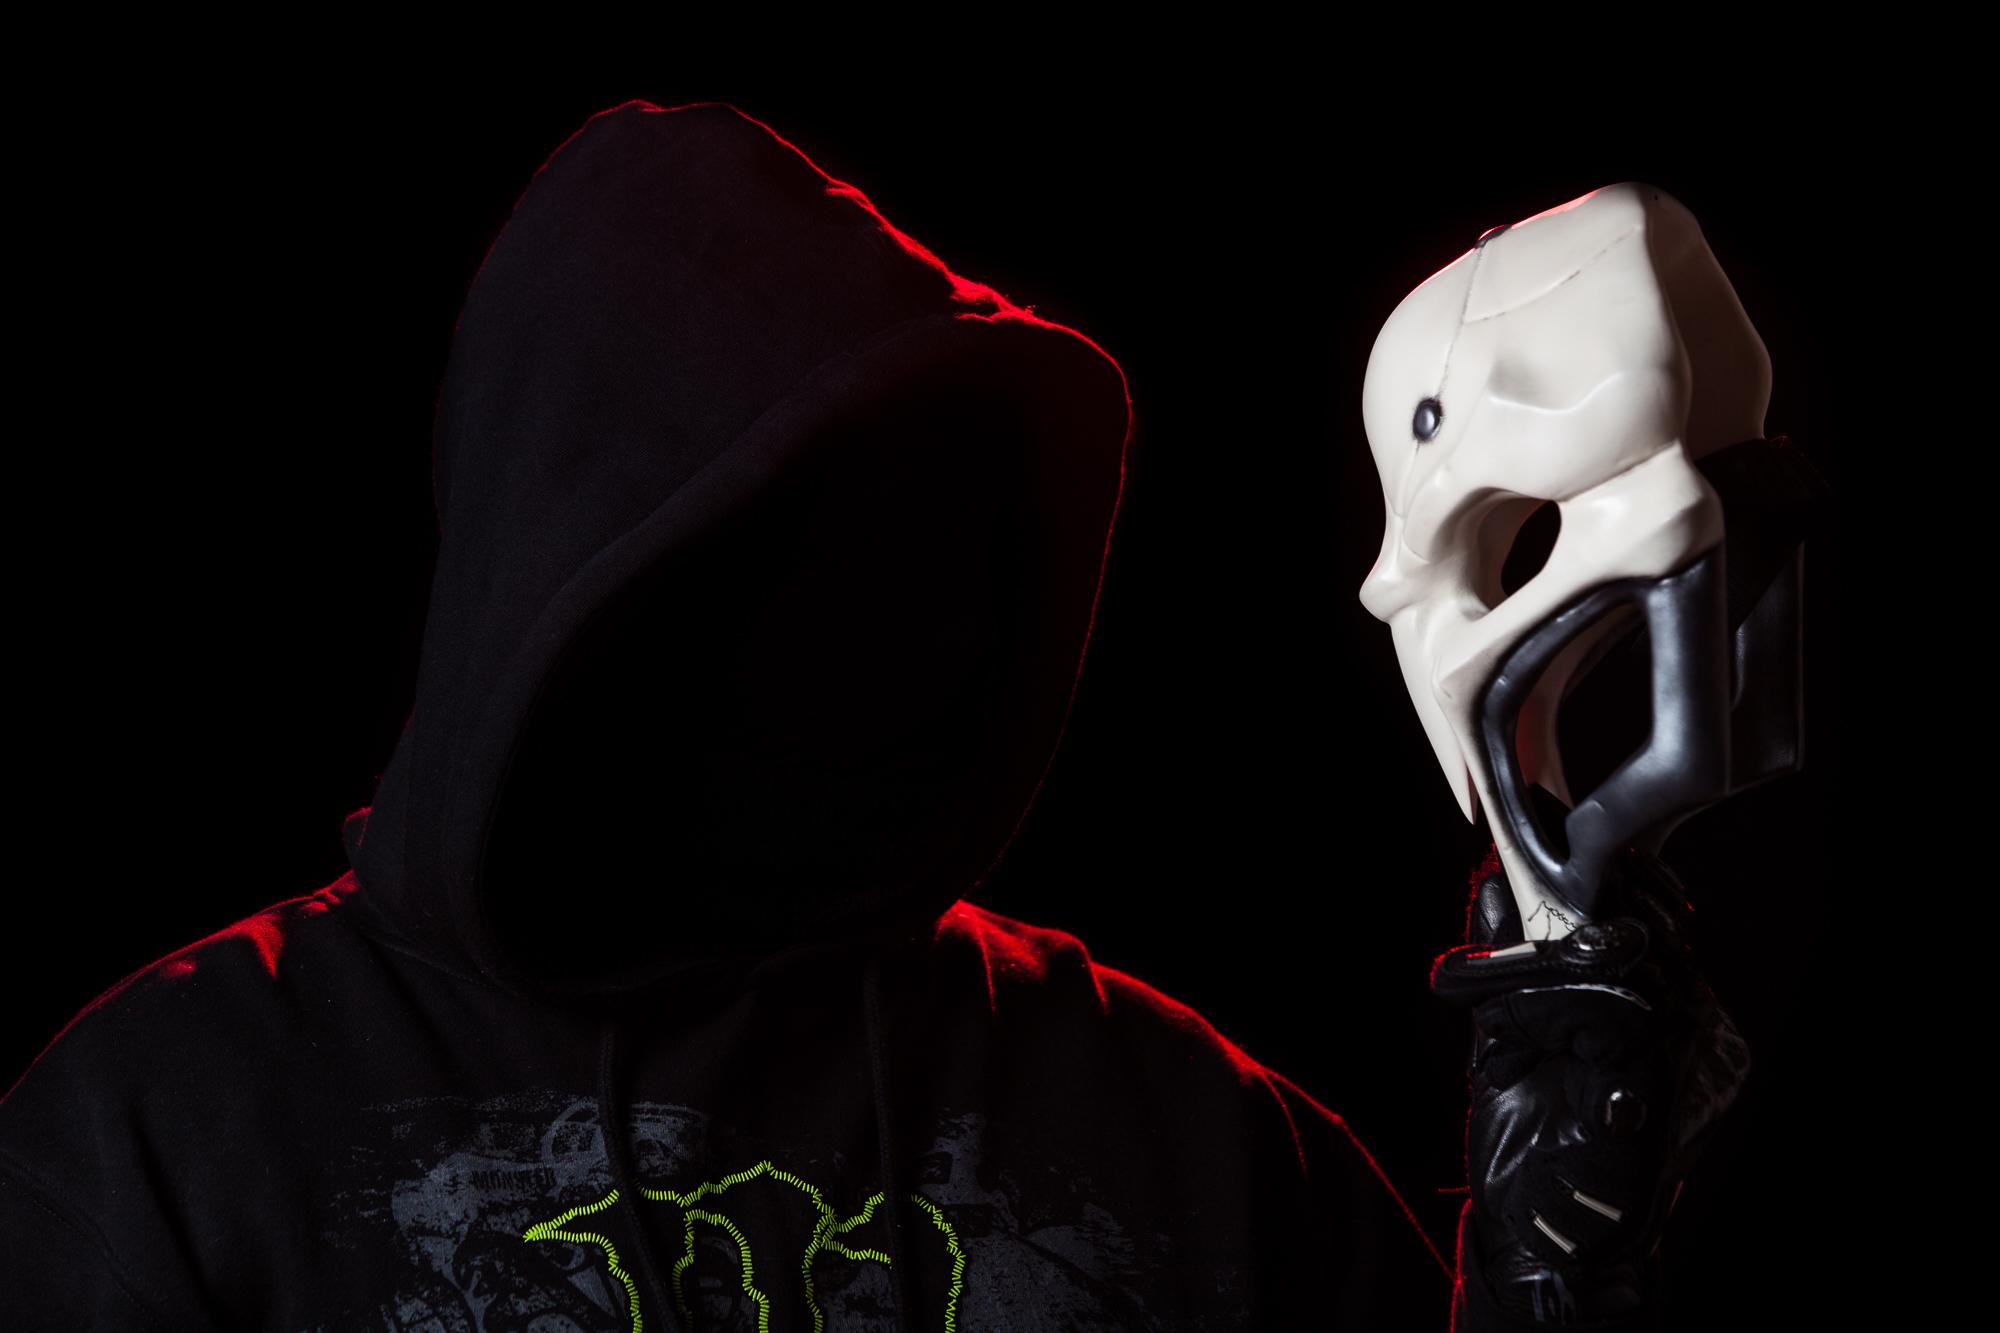 reapermask_yorick